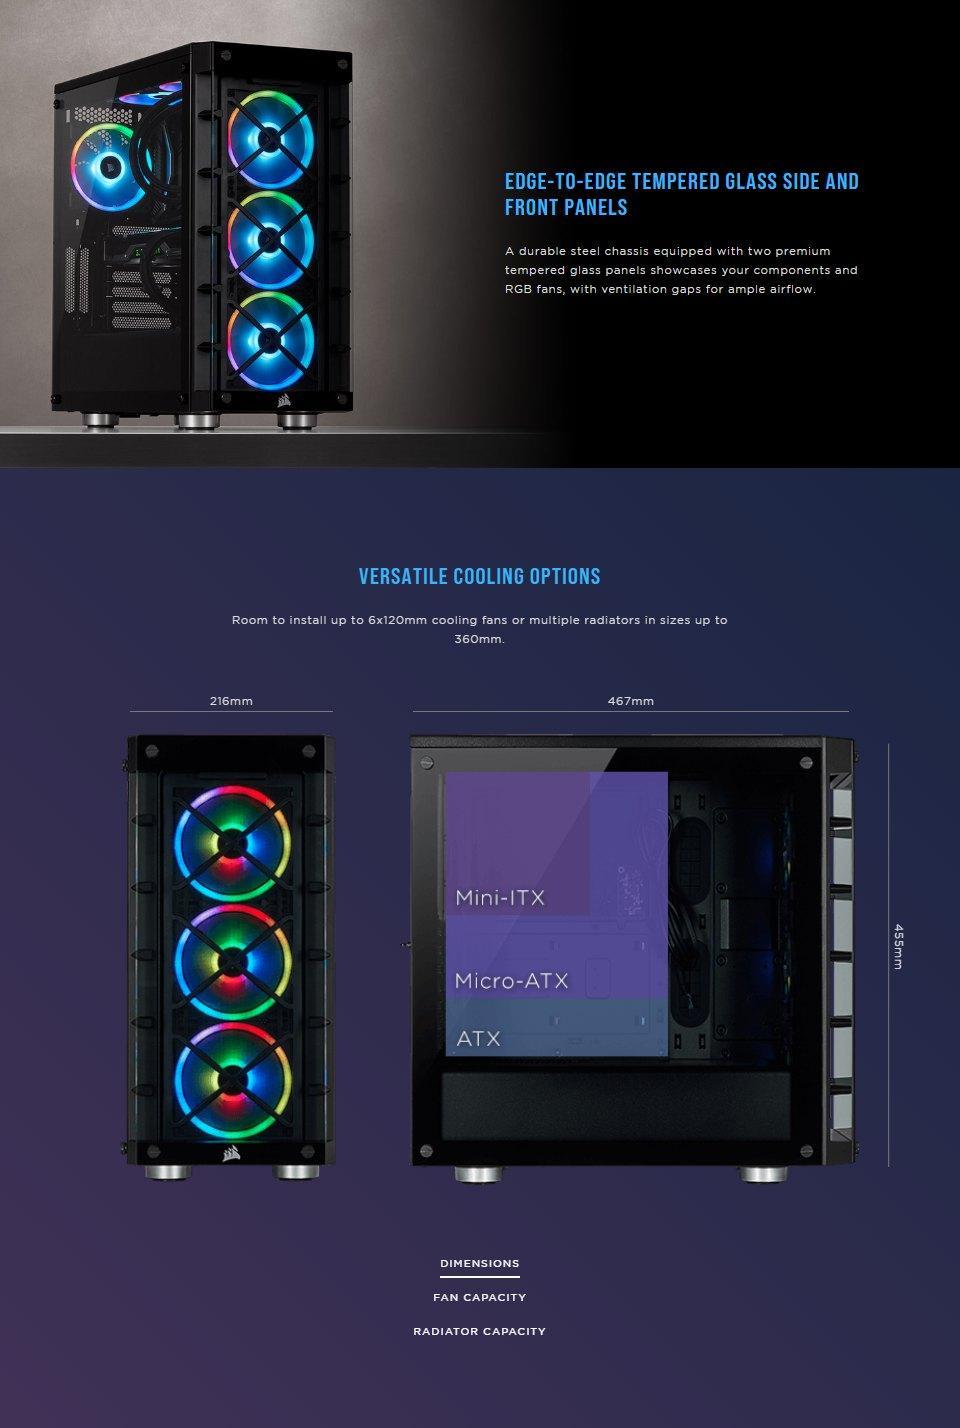 Corsair iCUE 465X RGB Tempered Glass Case Black features